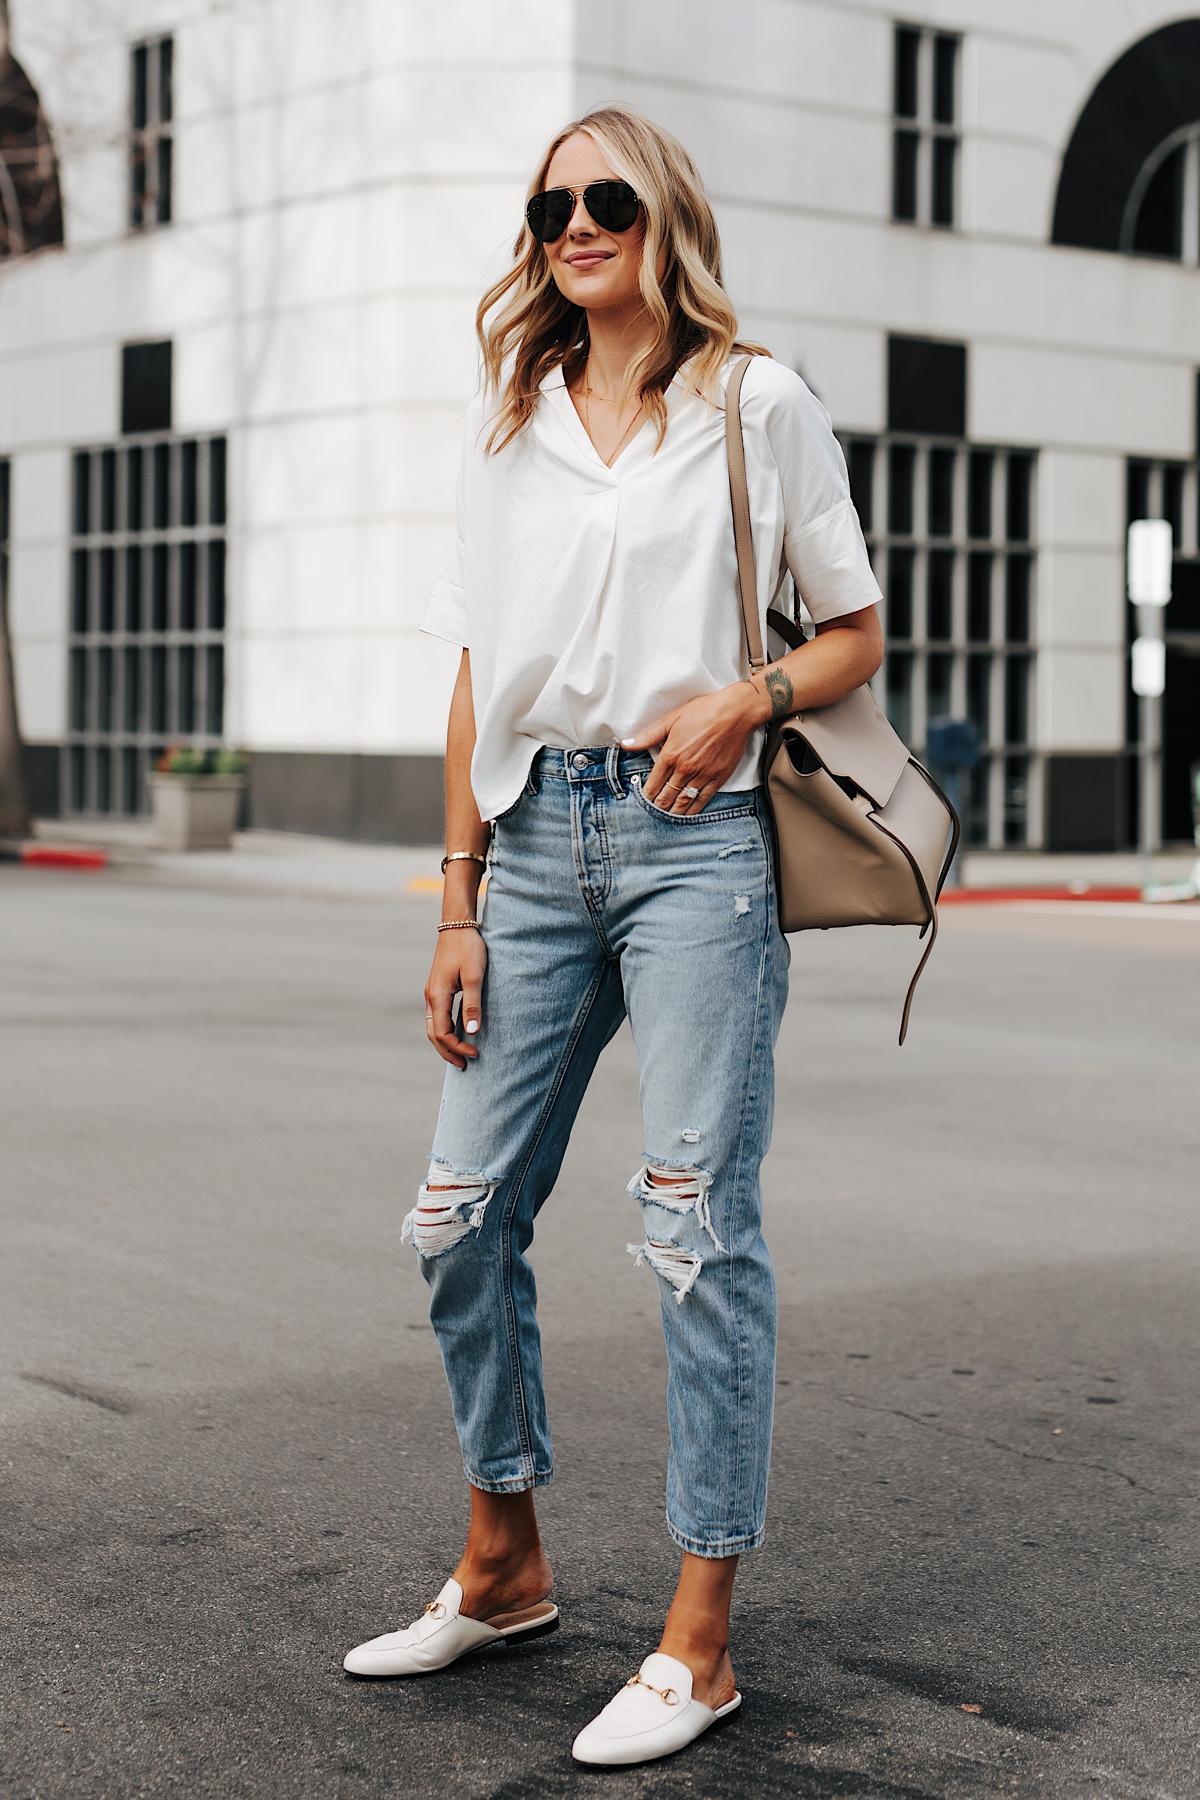 Fashion Jackson Wearing Short Sleeve White Shirt Everlane Ripped Boyfriend Jeans Gucci Princetown White Mules Celine Belt Bag